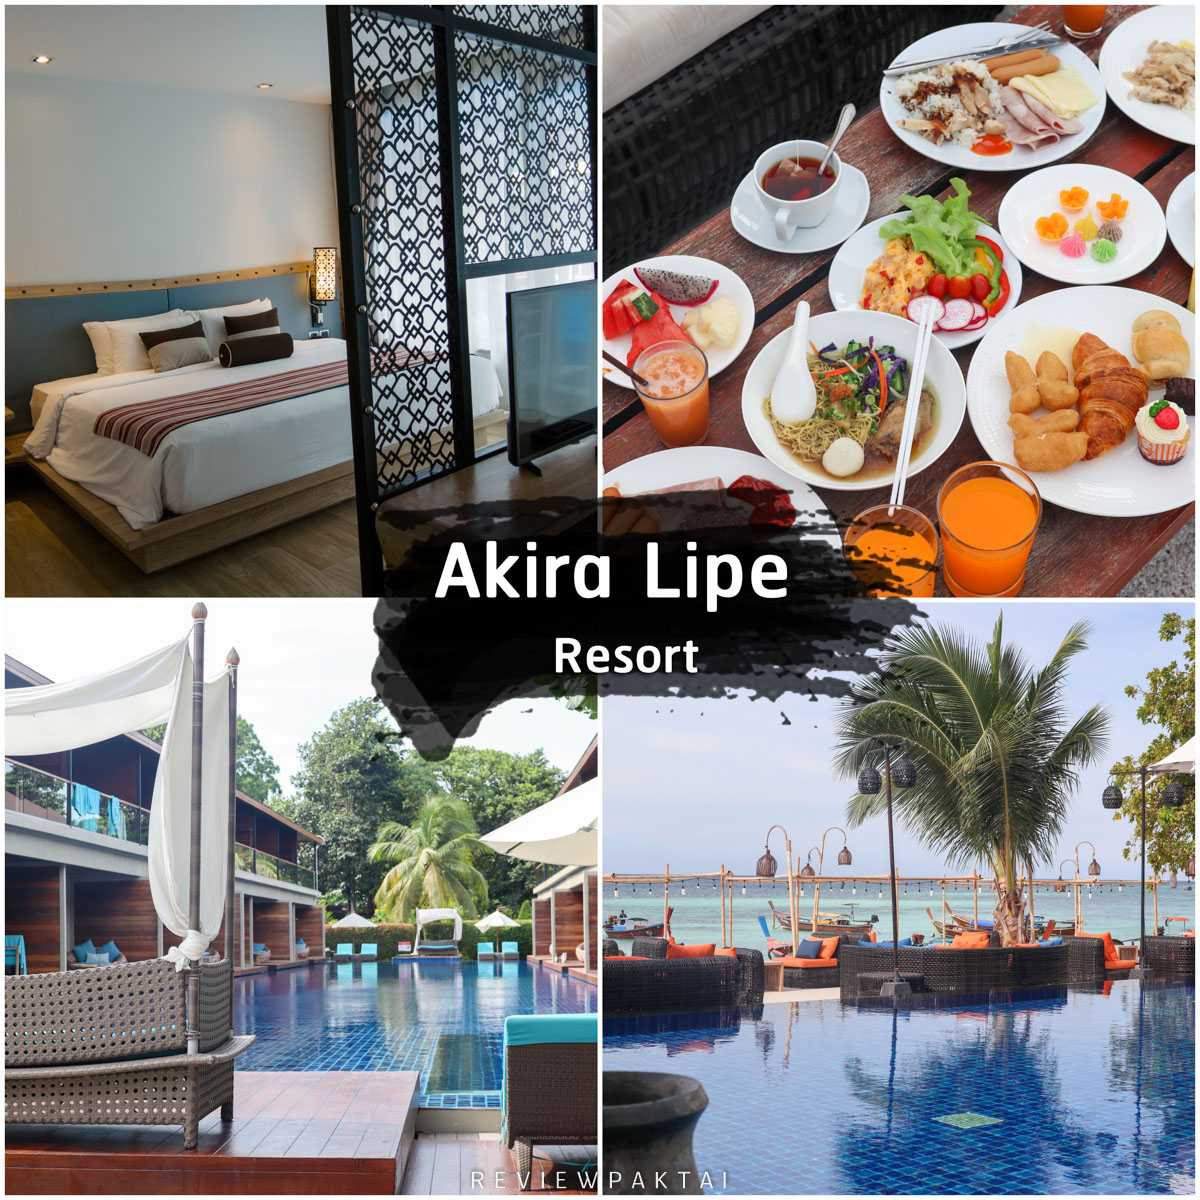 Akira Lipe Resort อีกหนึ่งรีสอร์ทสุดสวยวิวดีบนเกาะหลีเป๊ะ มีมุมจุดถ่ายรูปมากมายเลยทีเดียวครับ เตียงนอนนุ่มๆสบาย และไฮไลท์ทีเด็ดคือห้องพัก Pool Access ฟินๆ รายละเอียด คลิก จุดเช็คอิน,หลีเป๊ะ,สตูลสดยกกำลังสาม,satunwonderland,เที่ยวเมืองไทยAmazingกว่าเดิม,ชีพจรลงSouth